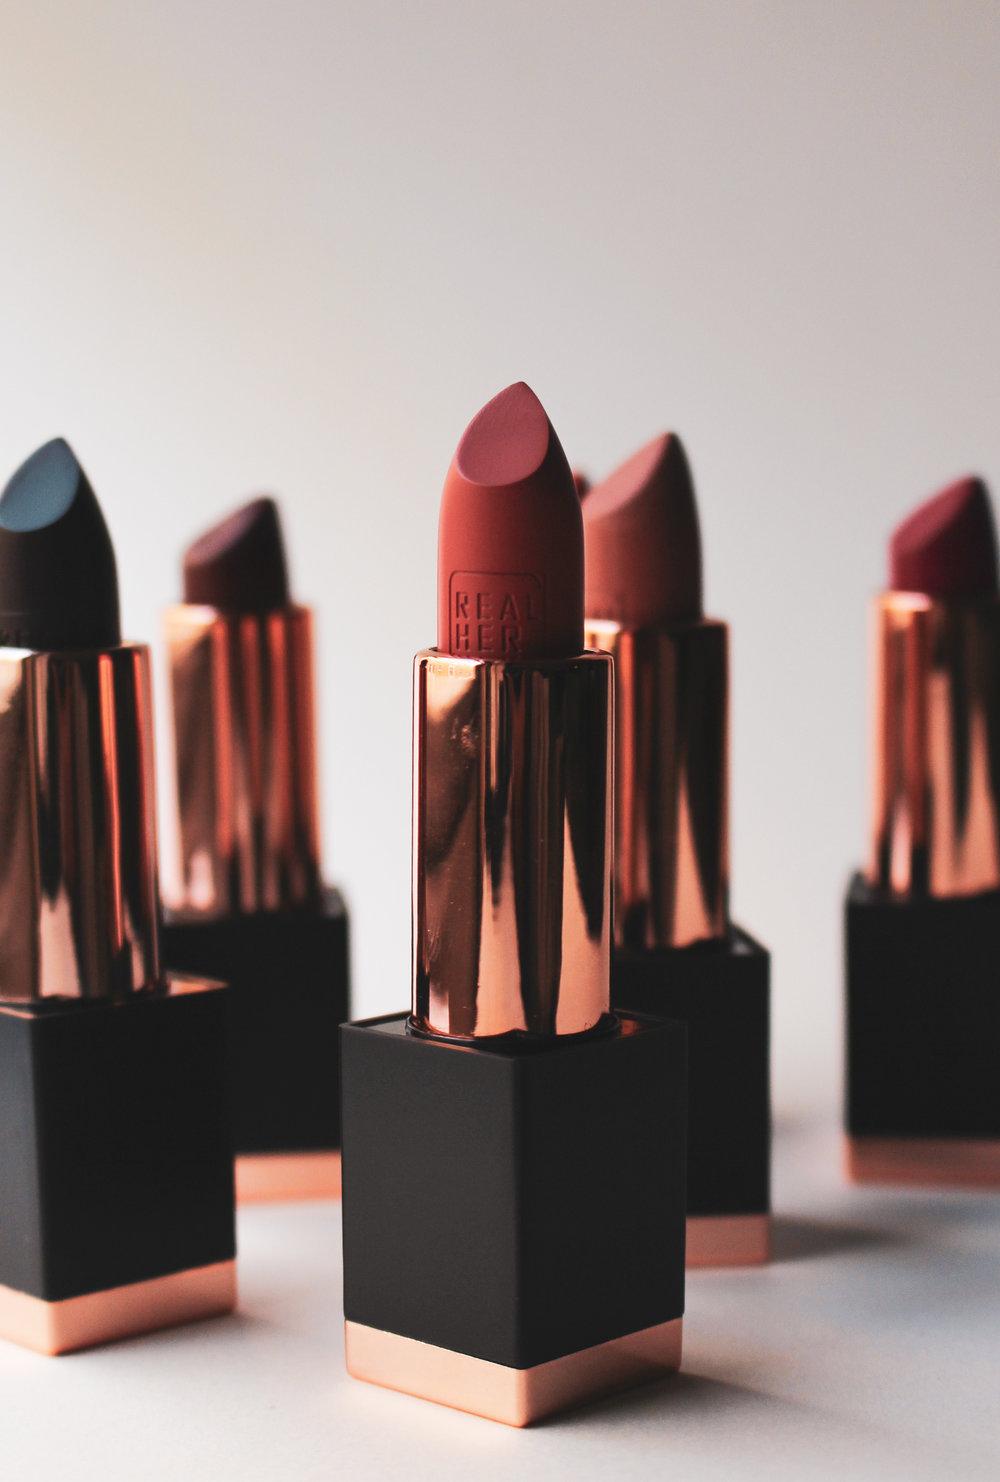 RealHer Matte Lipsticks